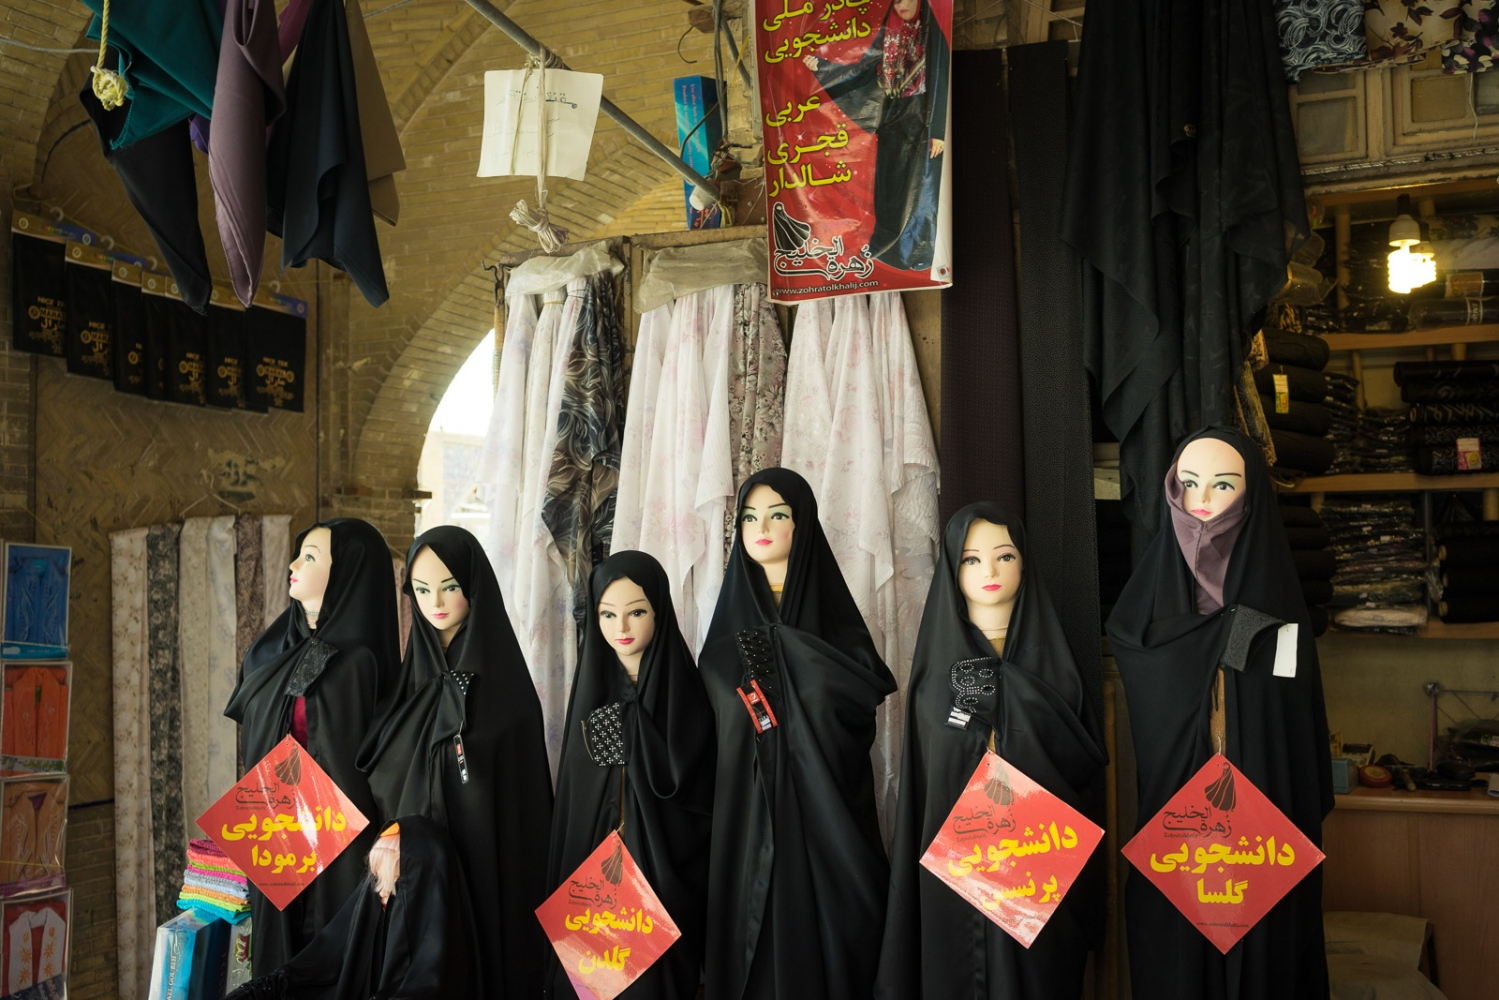 Art and Documentary Photography - Loading 012-iran_consumerism.jpg